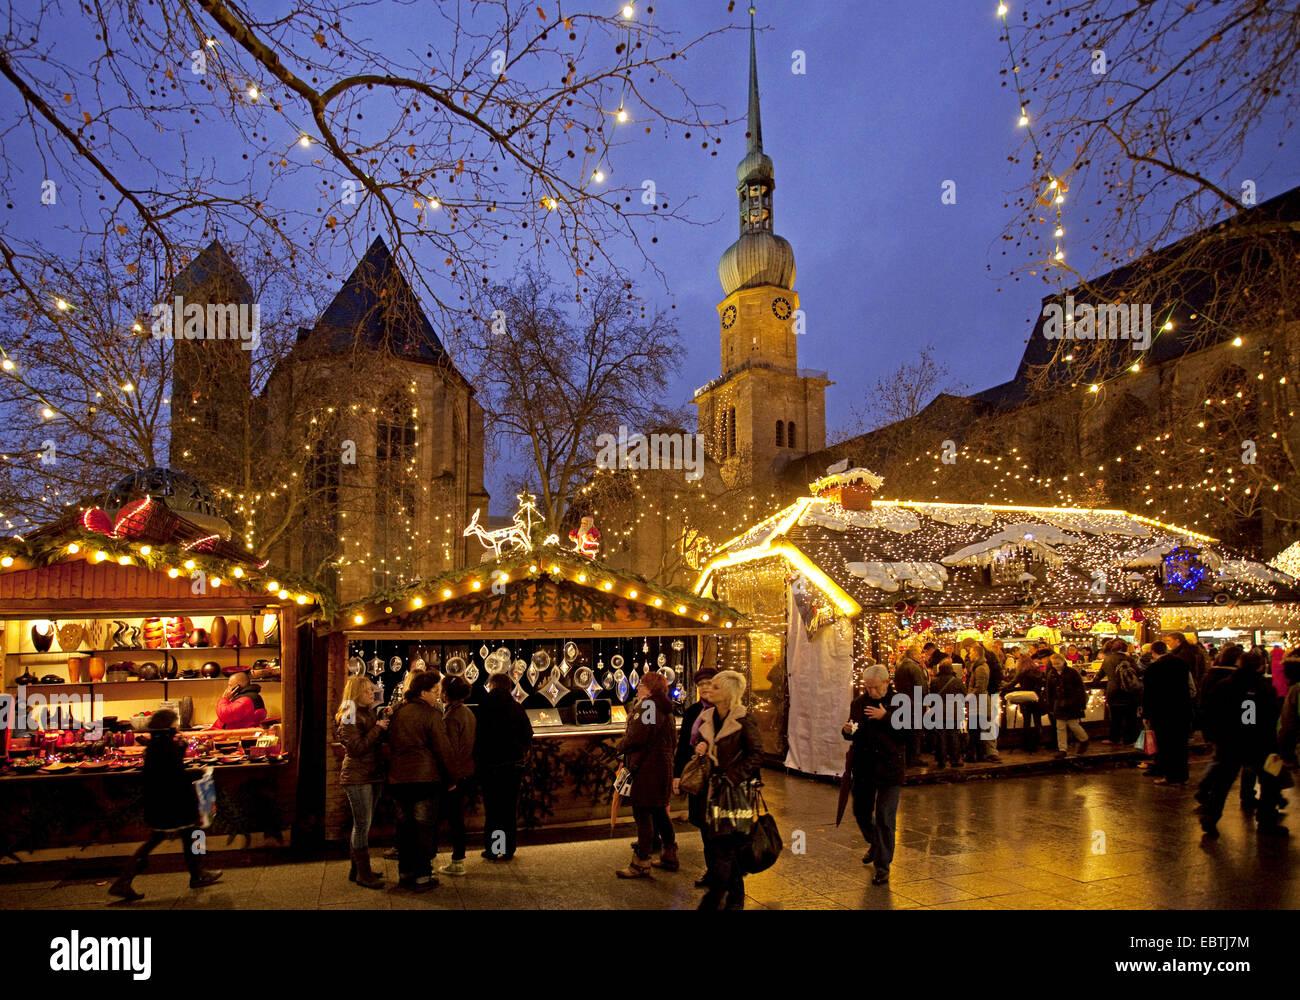 christmas market in inner city, Reinoldikirche and Marienkirche in background, Germany, North Rhine-Westphalia, - Stock Image